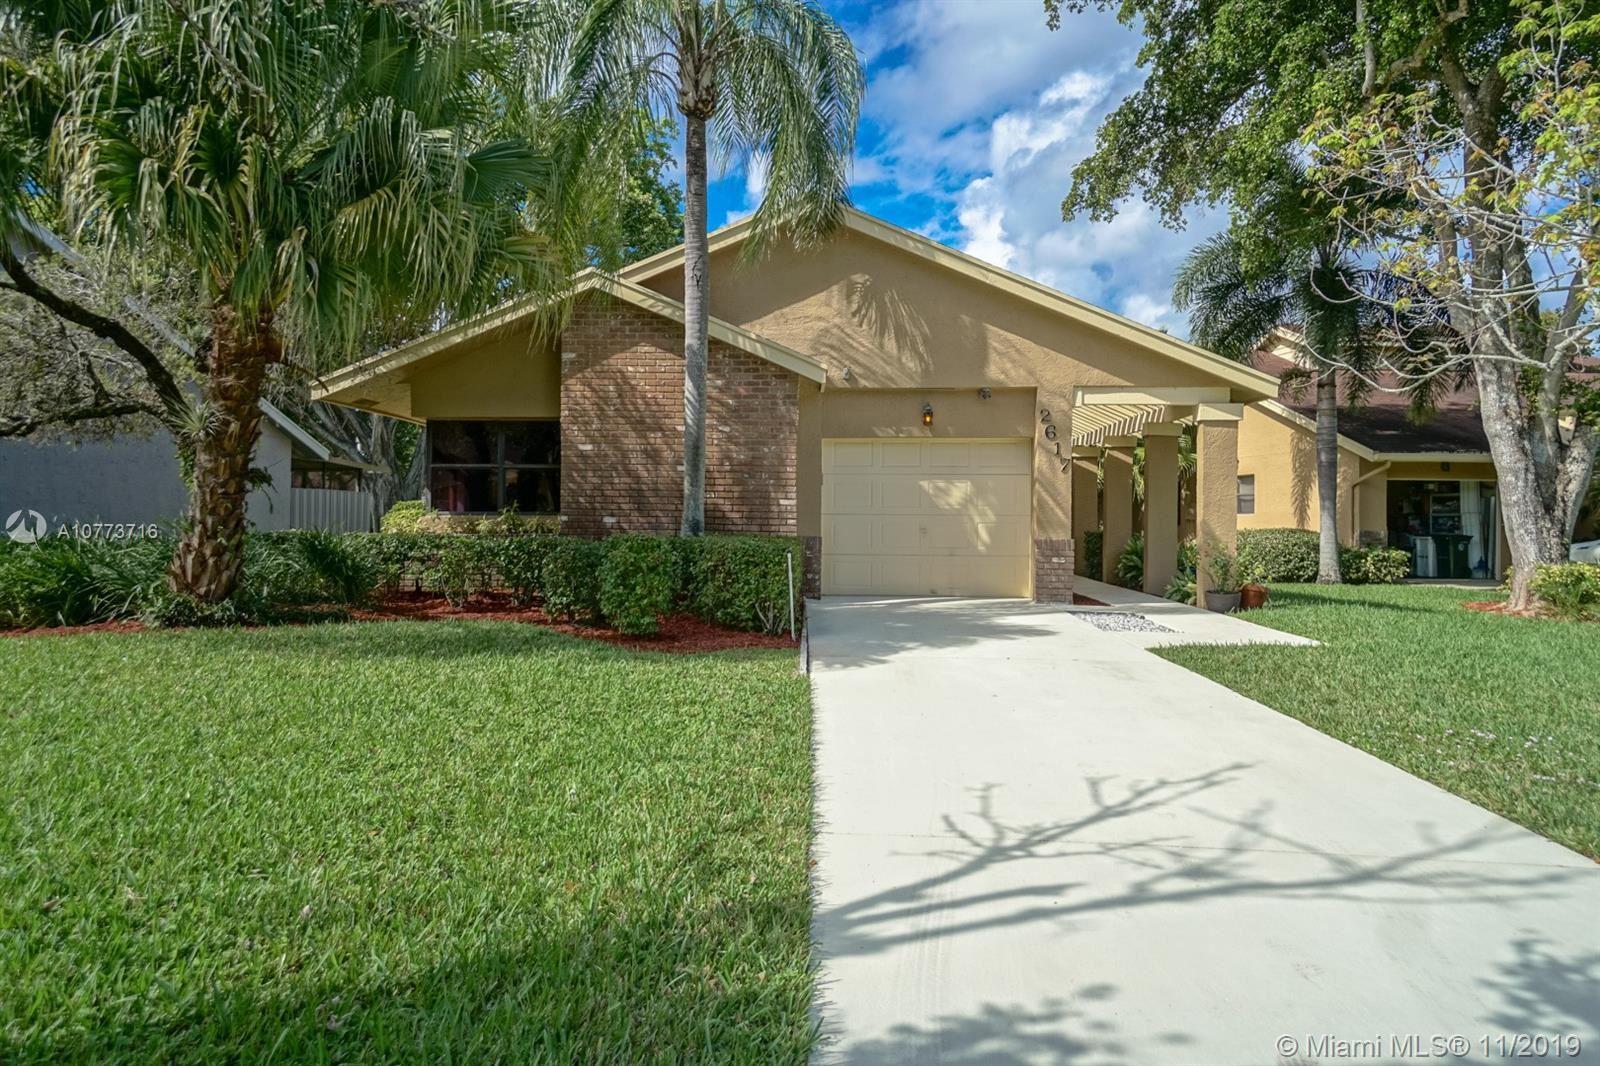 2617 Aloe Avenue, Coconut Creek, FL 33063 - MLS#: A10773716